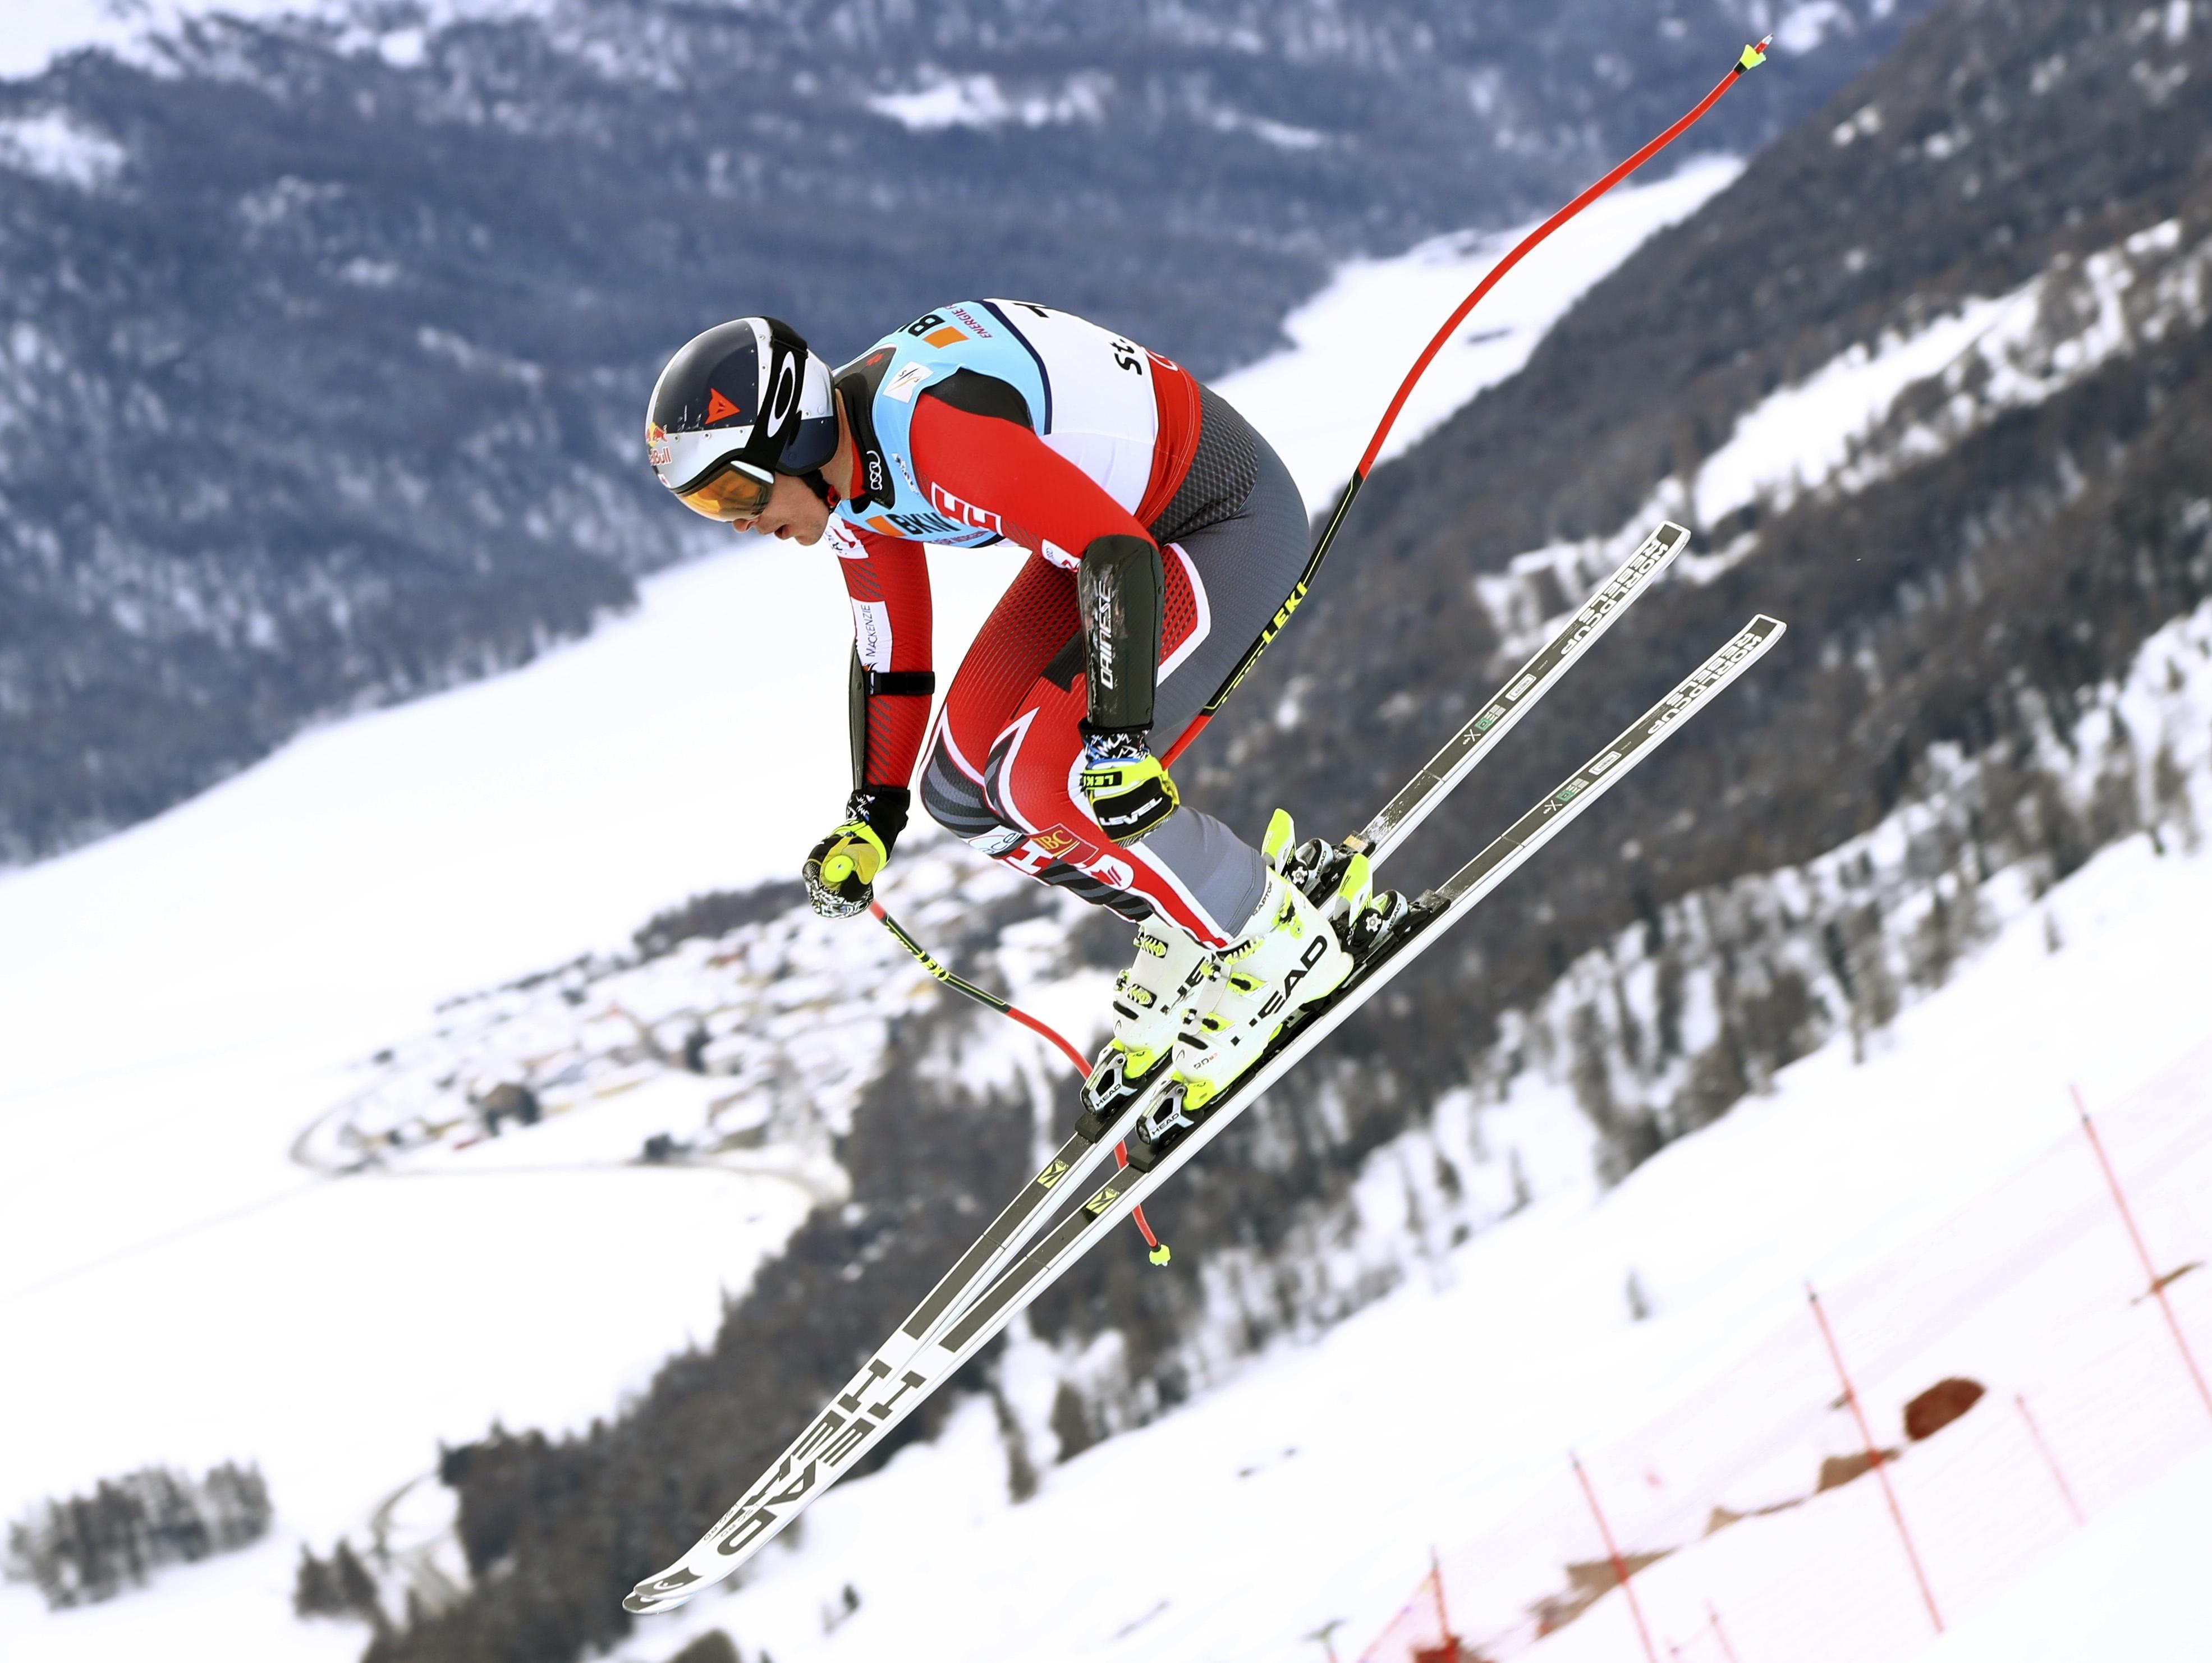 Canada's Erik Guay is airborne during a men's super-G, at the alpine ski World Championships, in St. Moritz, Switzerland, Wednesday, Feb. 8, 2017. (AP Photo/Alessandro Trovati)